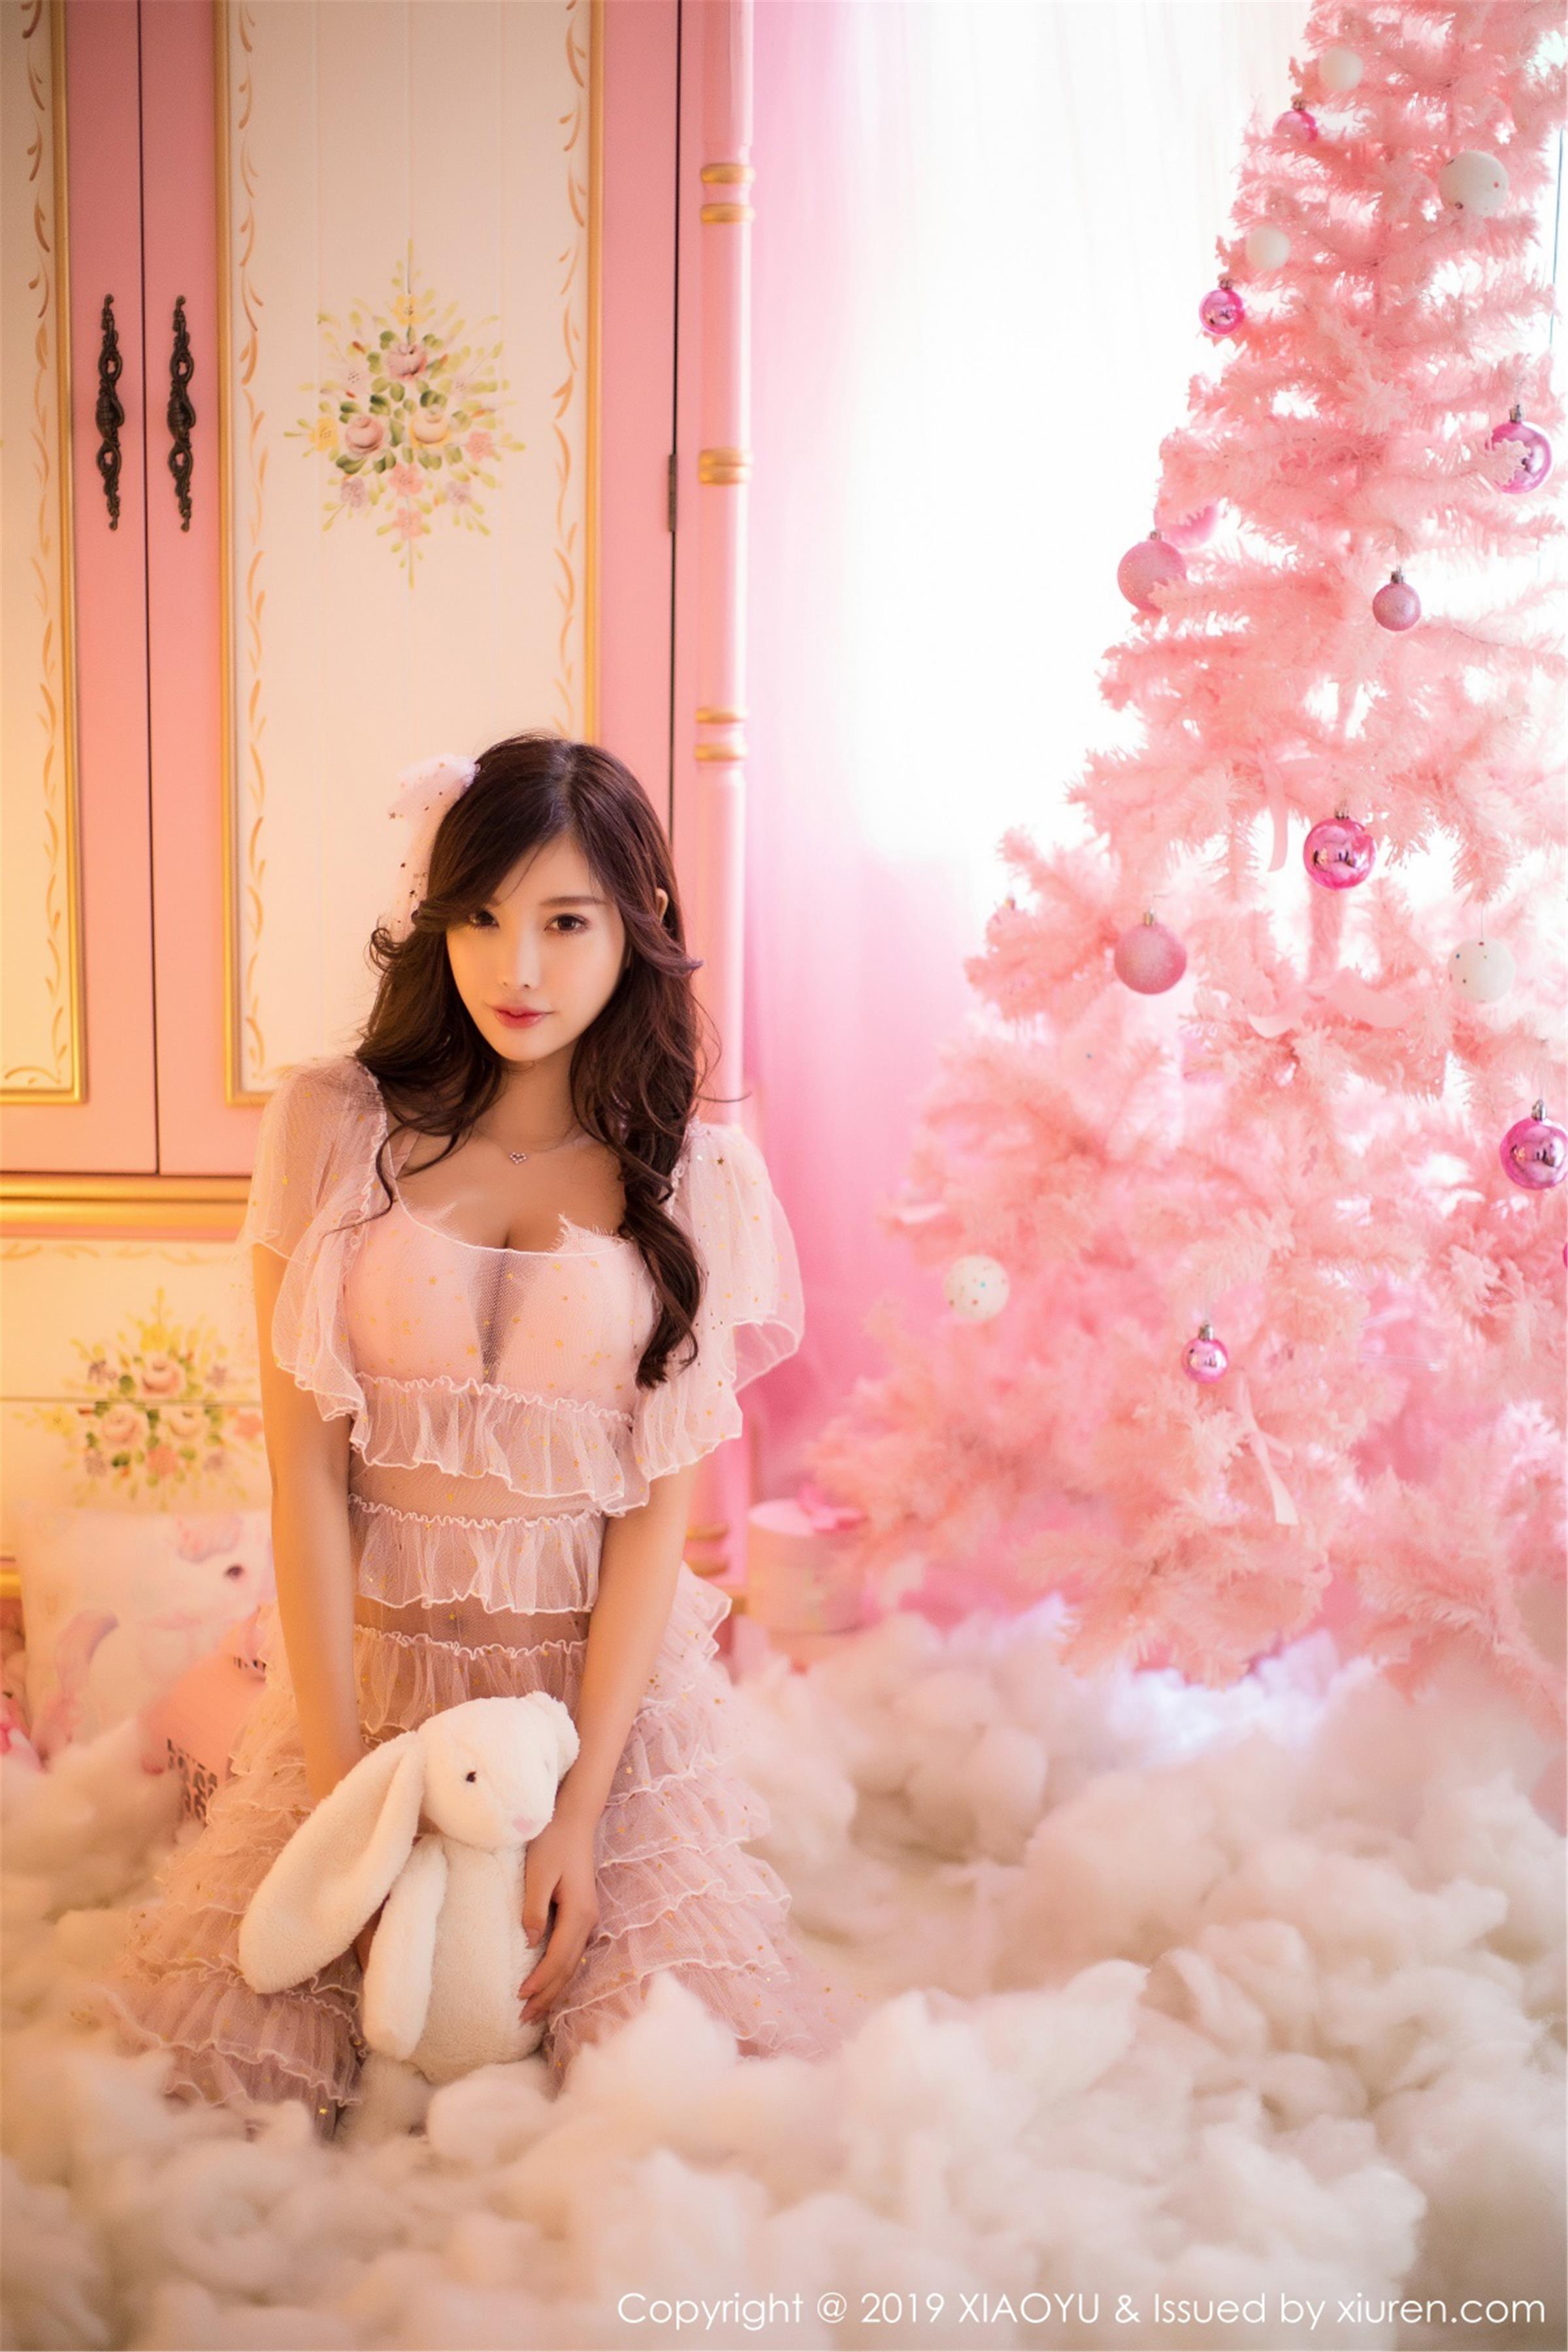 [XIAOYU画语界]YU20190426VOL0059 杨晨晨sugar 粉色透视连衣裙与白色塑身内衣性感私房写真集